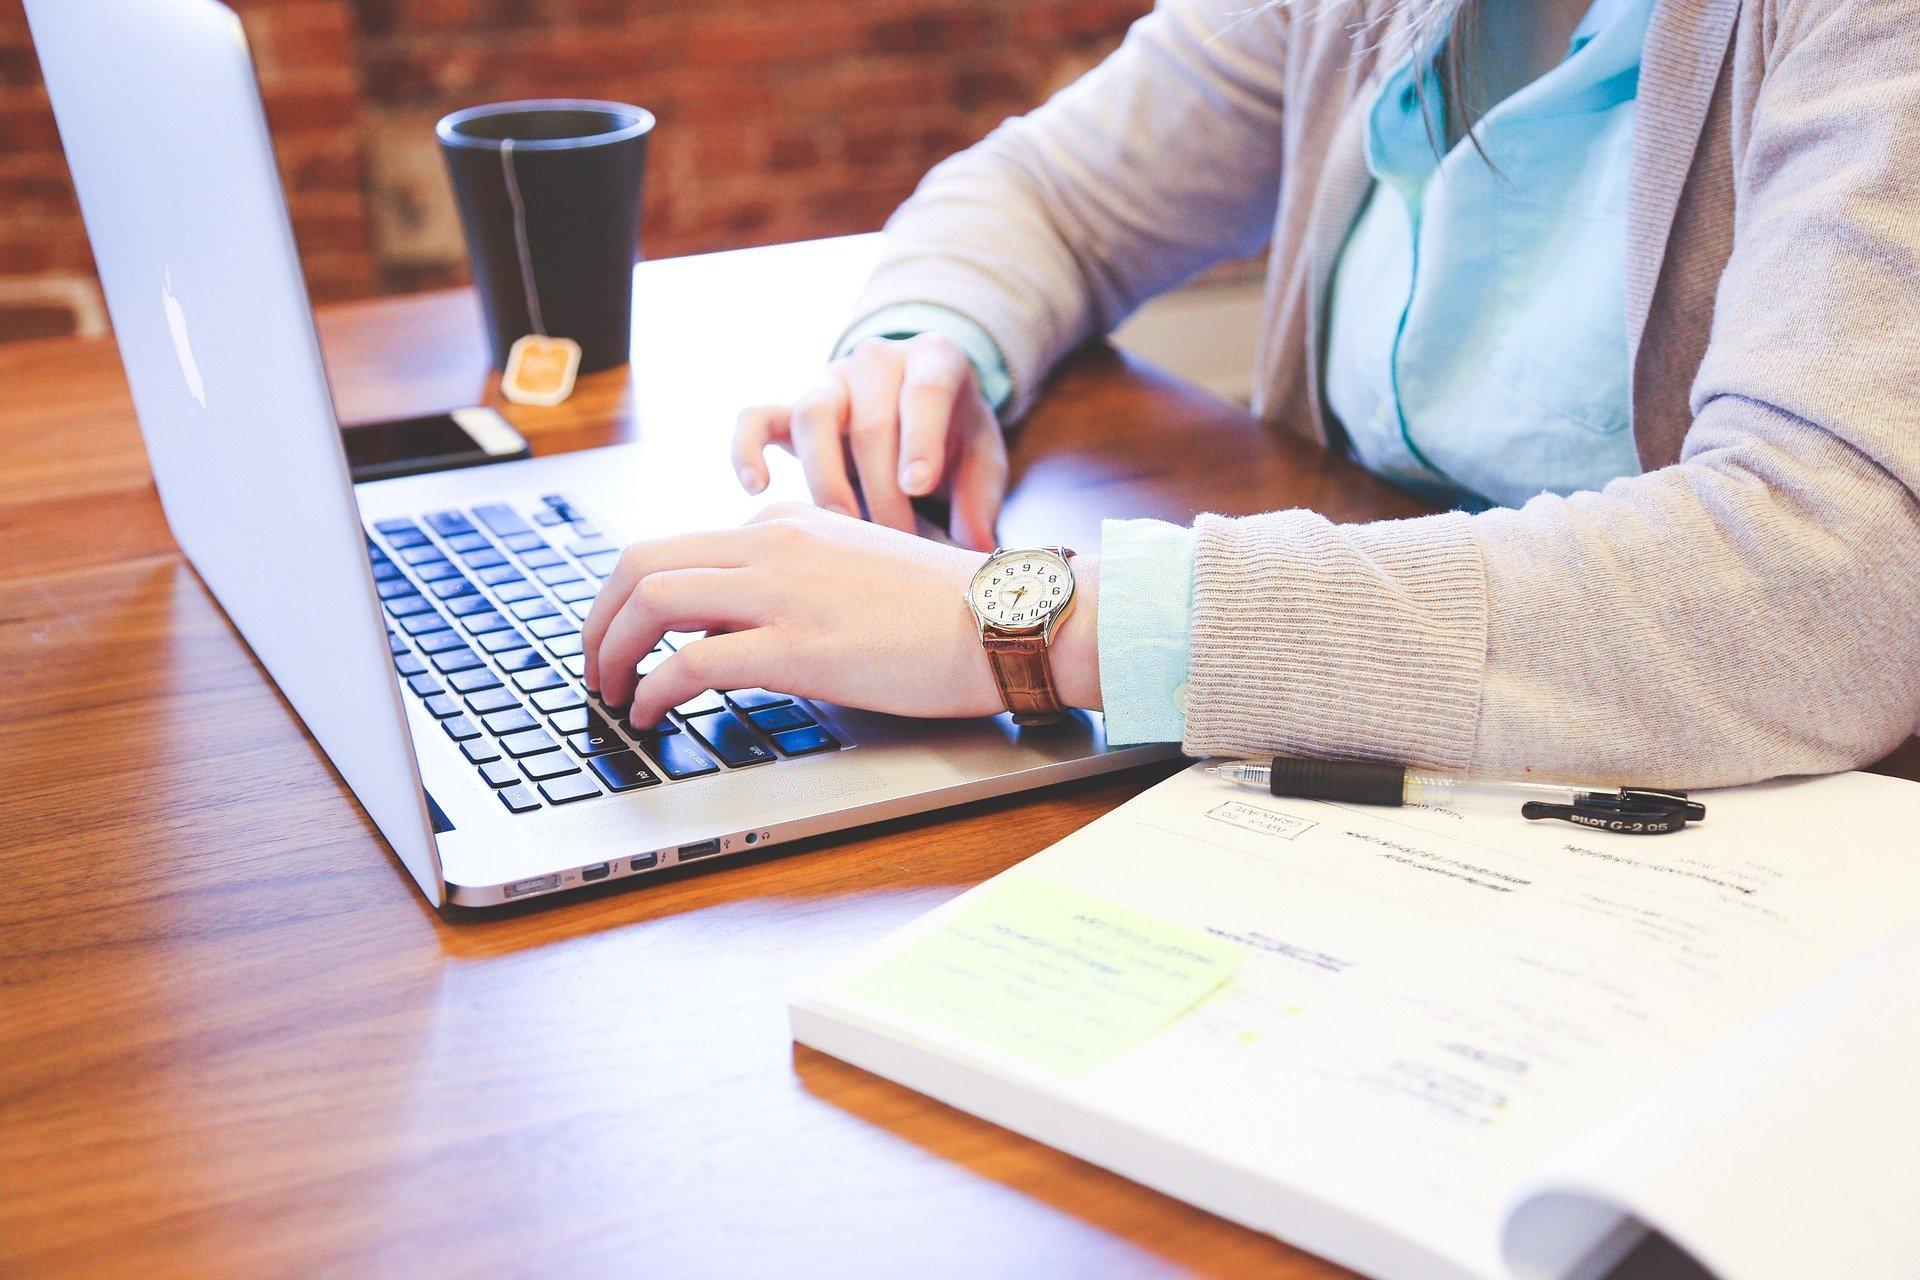 Metodi di analisi e valutazione per una corretta gestione d'impresa